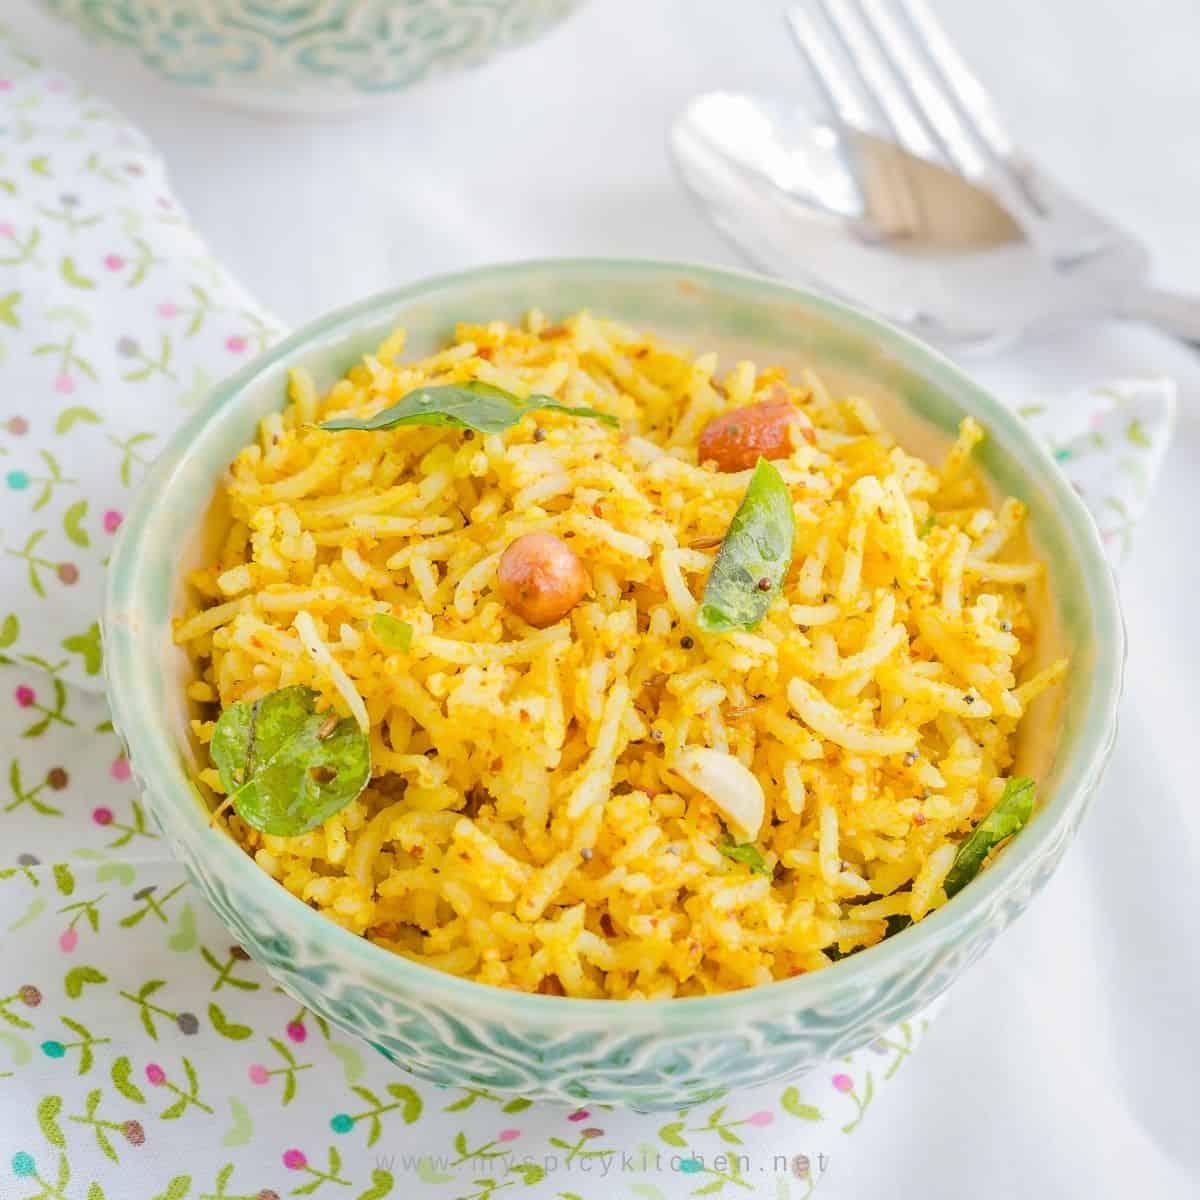 Bowl of groundnut rice.